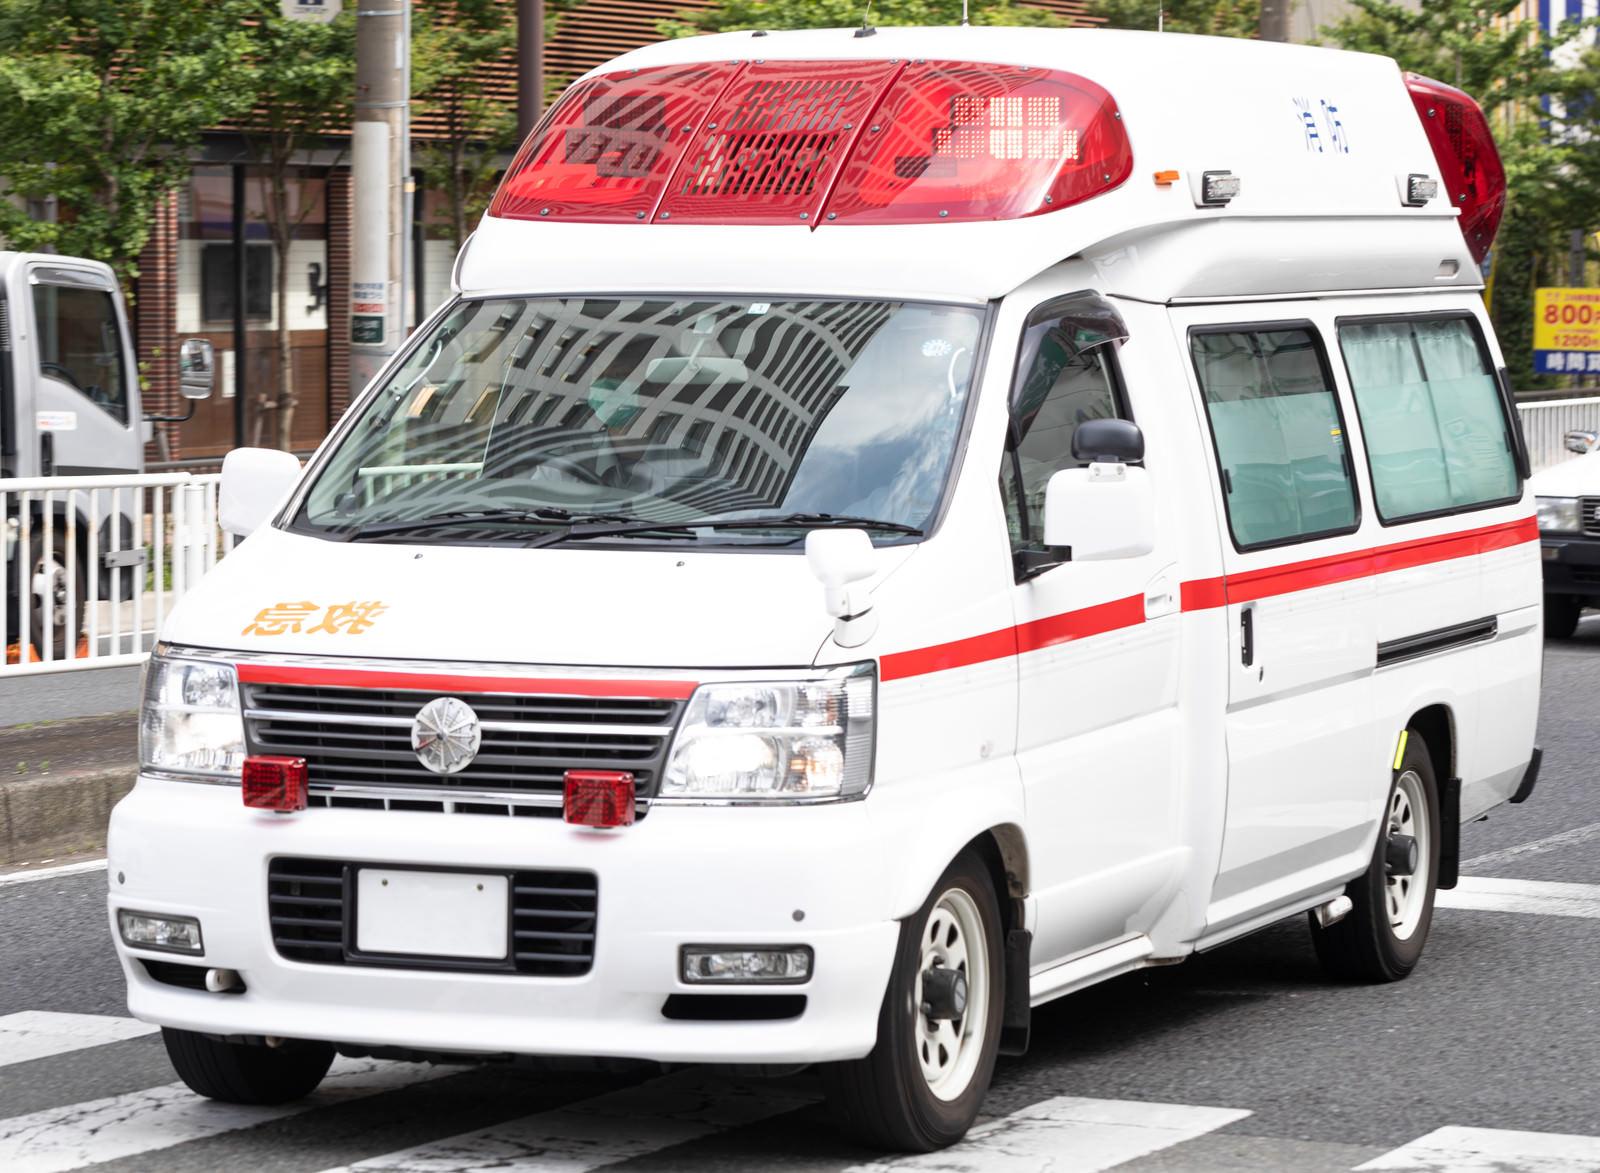 「救急車」の写真